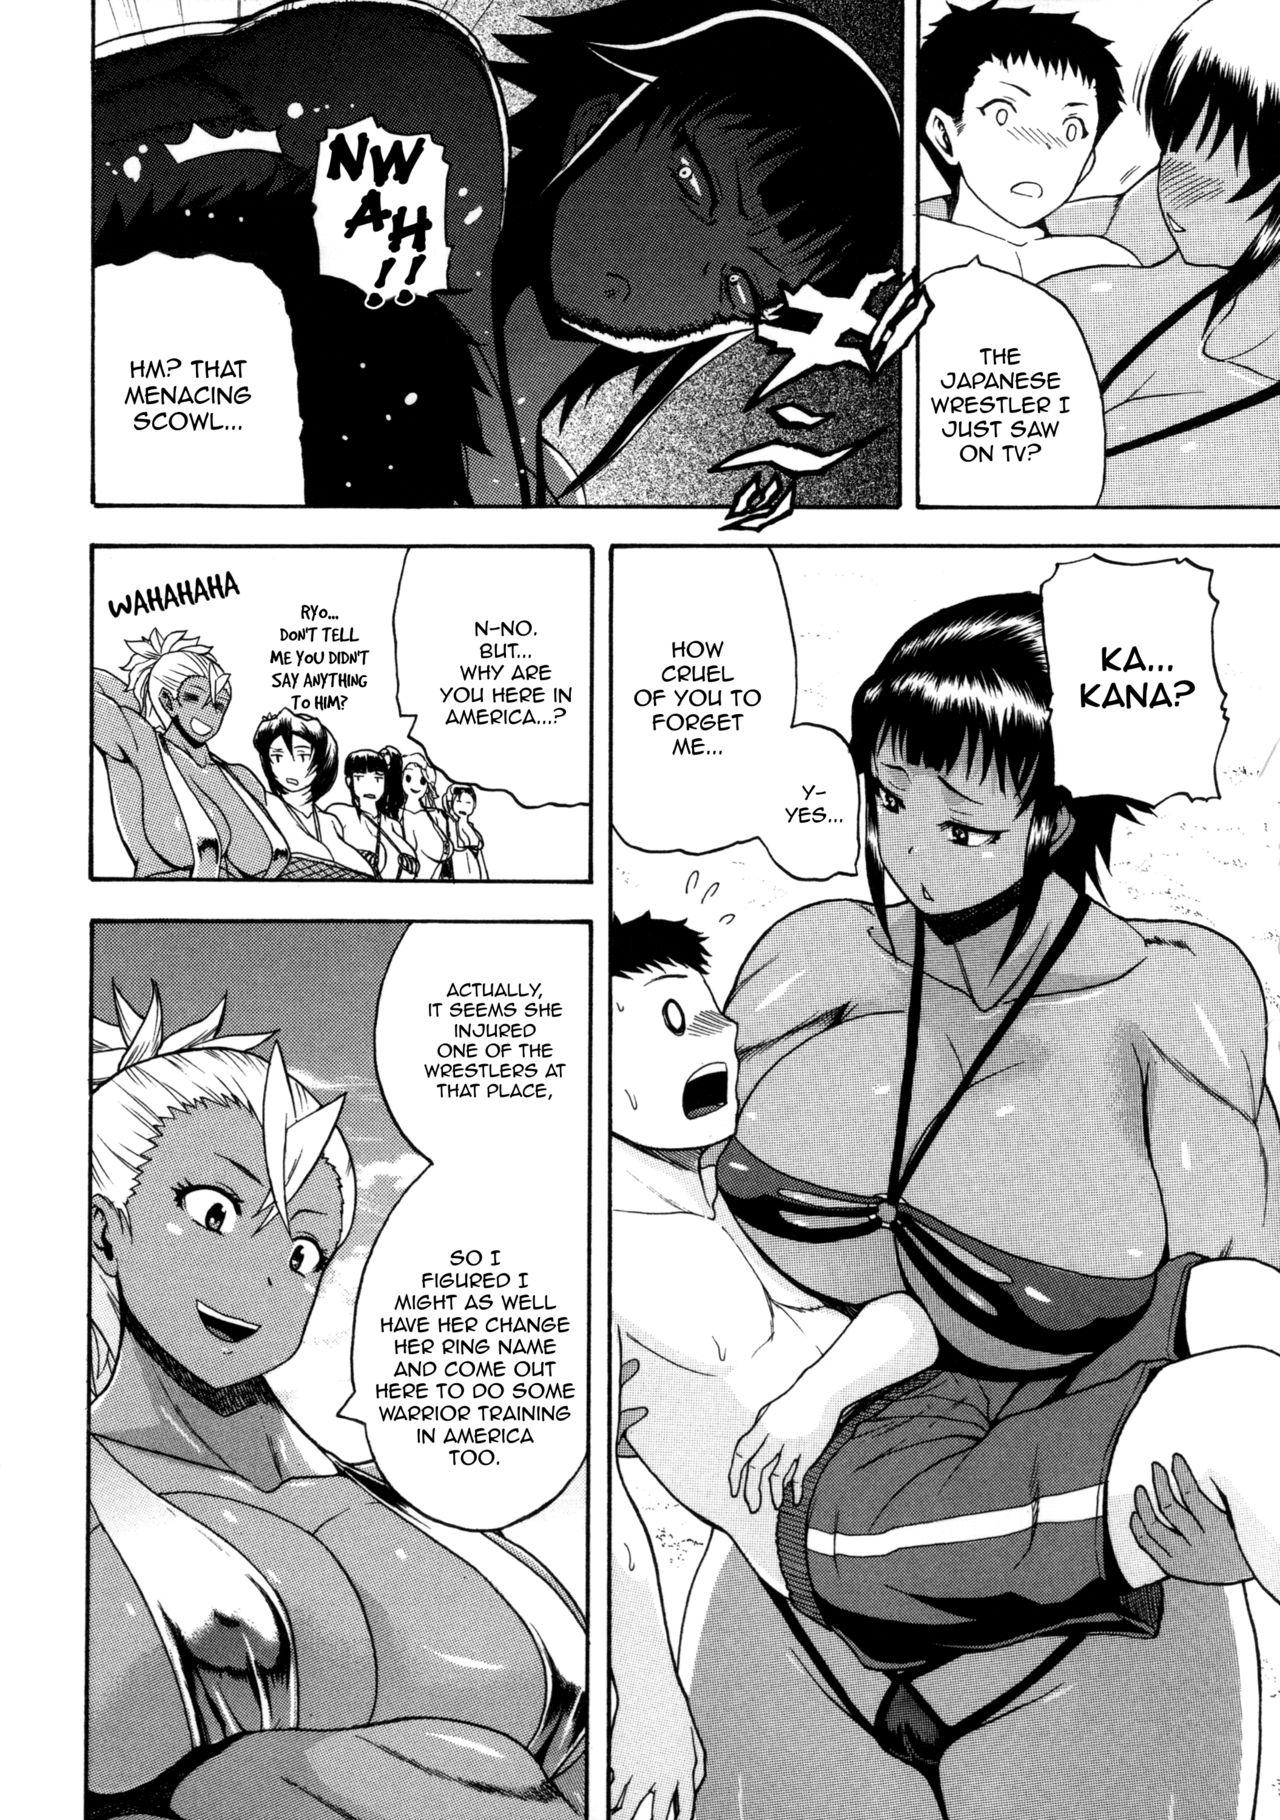 [Yoshimura Tatsumaki] Monzetsu Taigatame ~Count 3 de Ikasete Ageru~ | Faint in Agony Bodylock ~I'll make you cum on the count of 3~ [English] [Brolen] 194